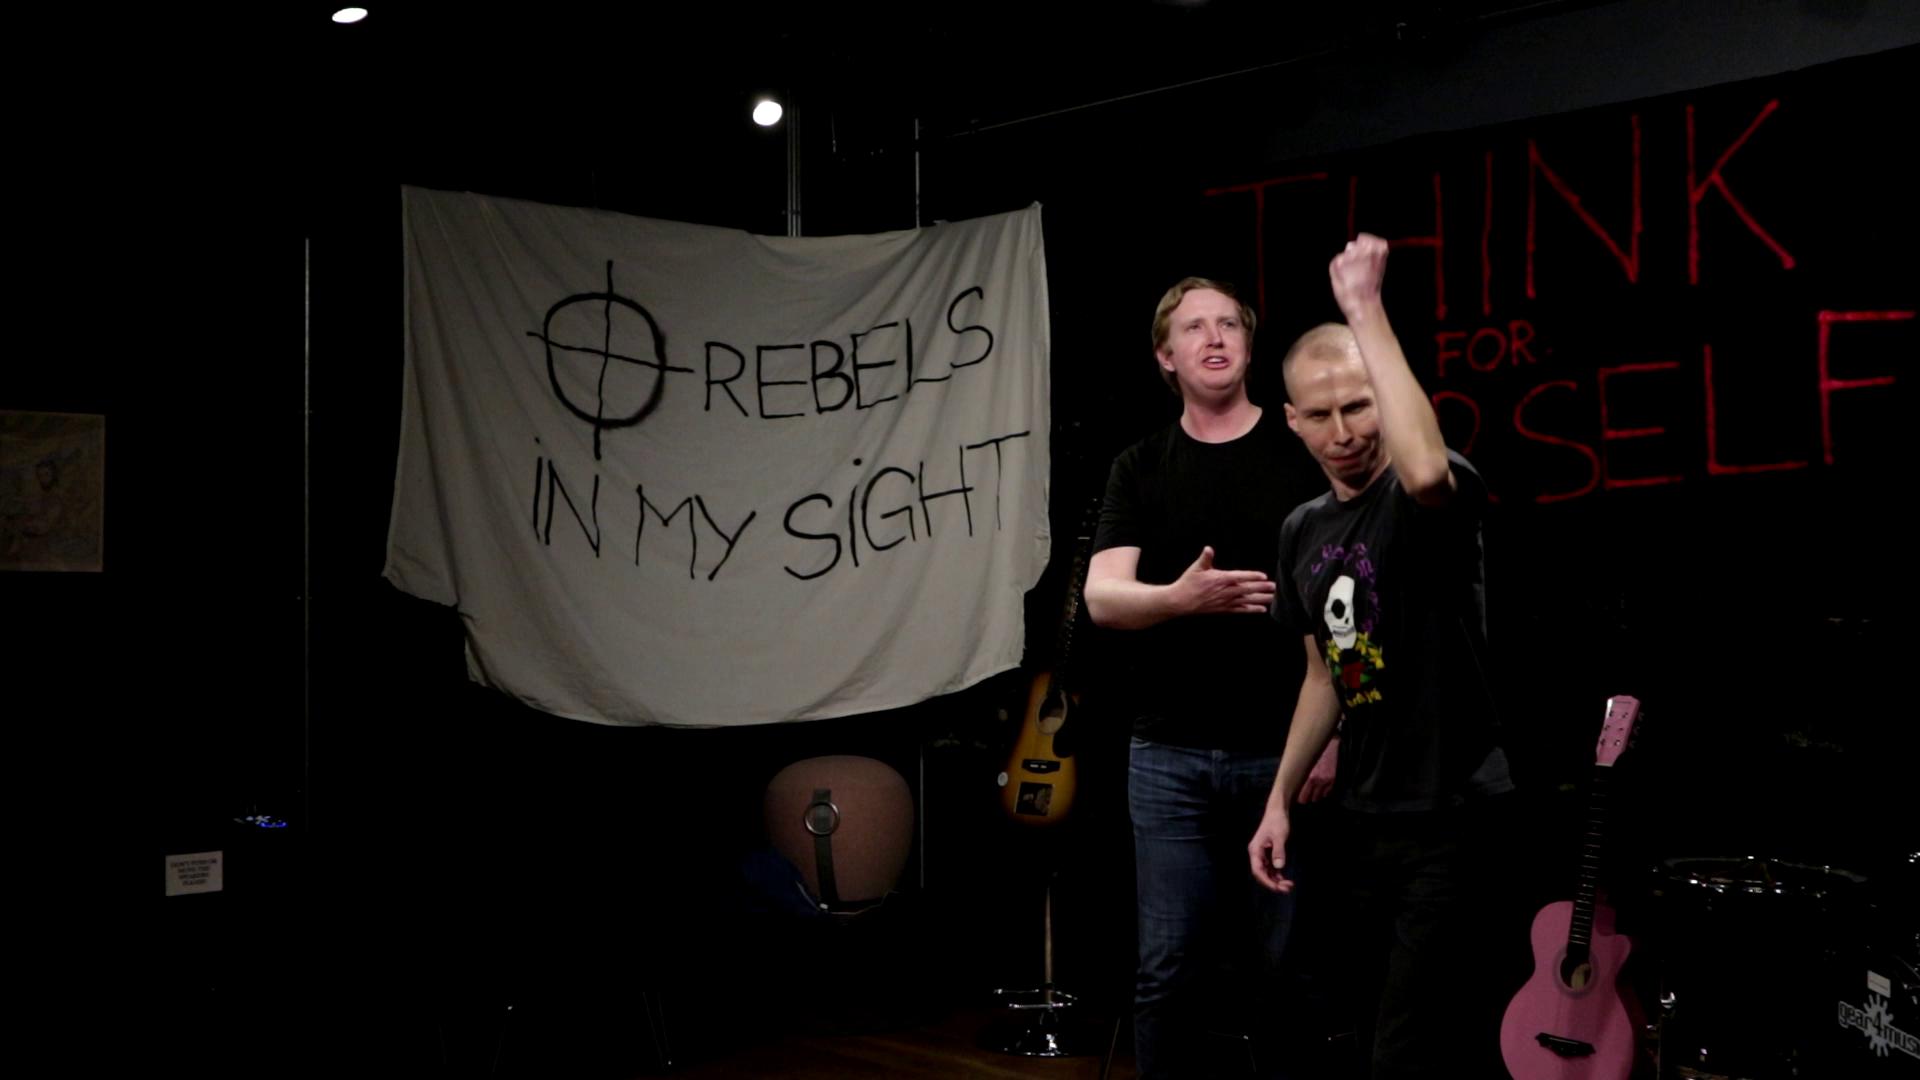 Rebels in My Sight (DK)